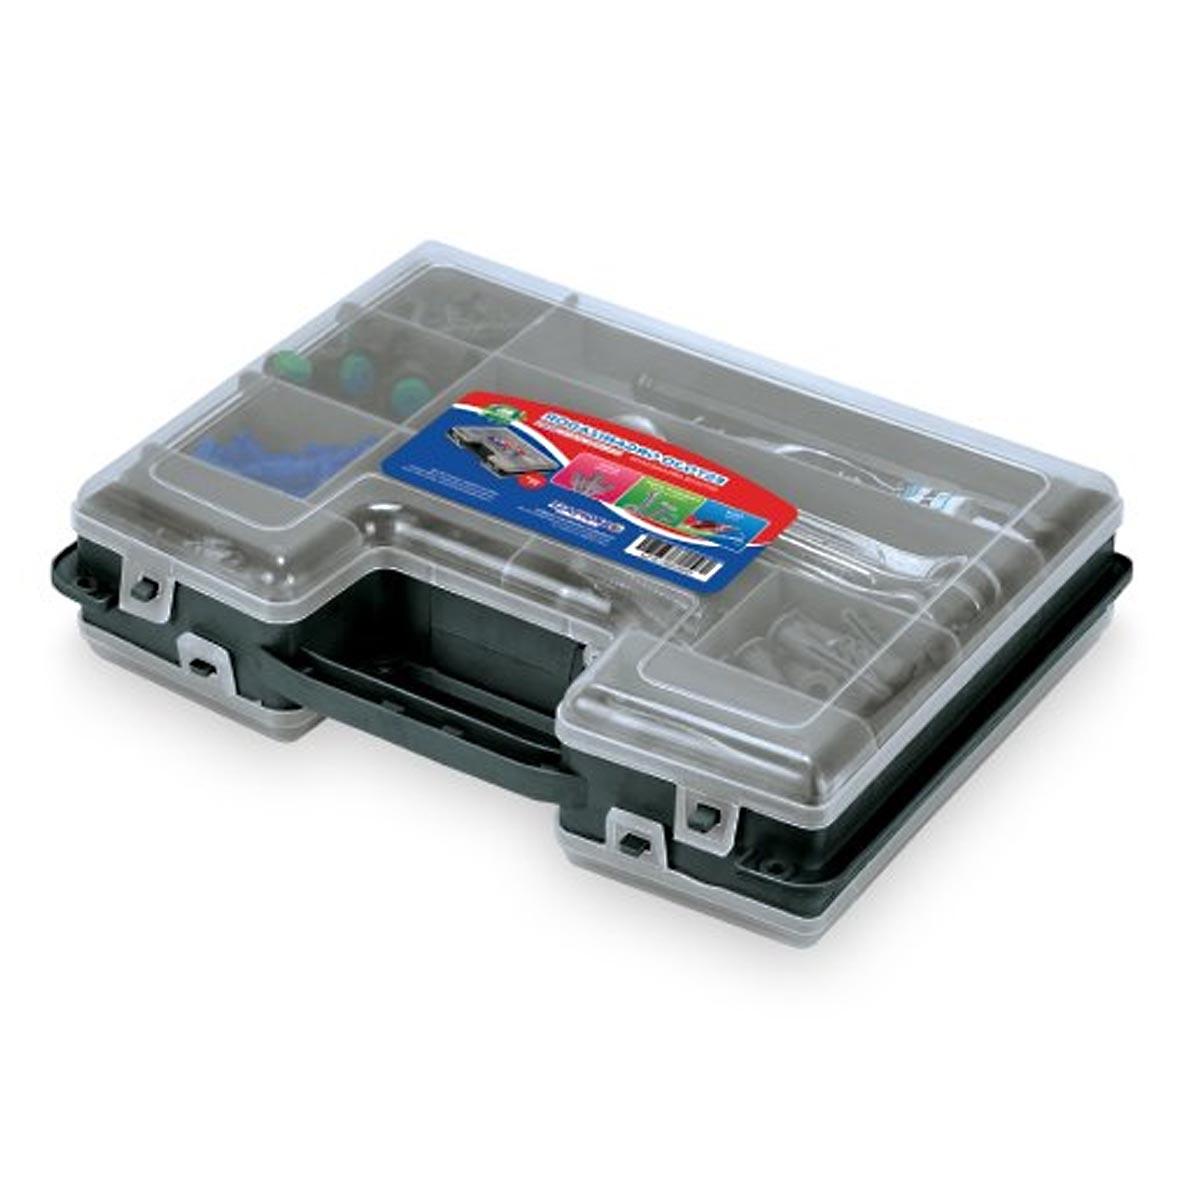 "Estojo Organizador Arqplast Double Case DC 8001 11"" 25393"